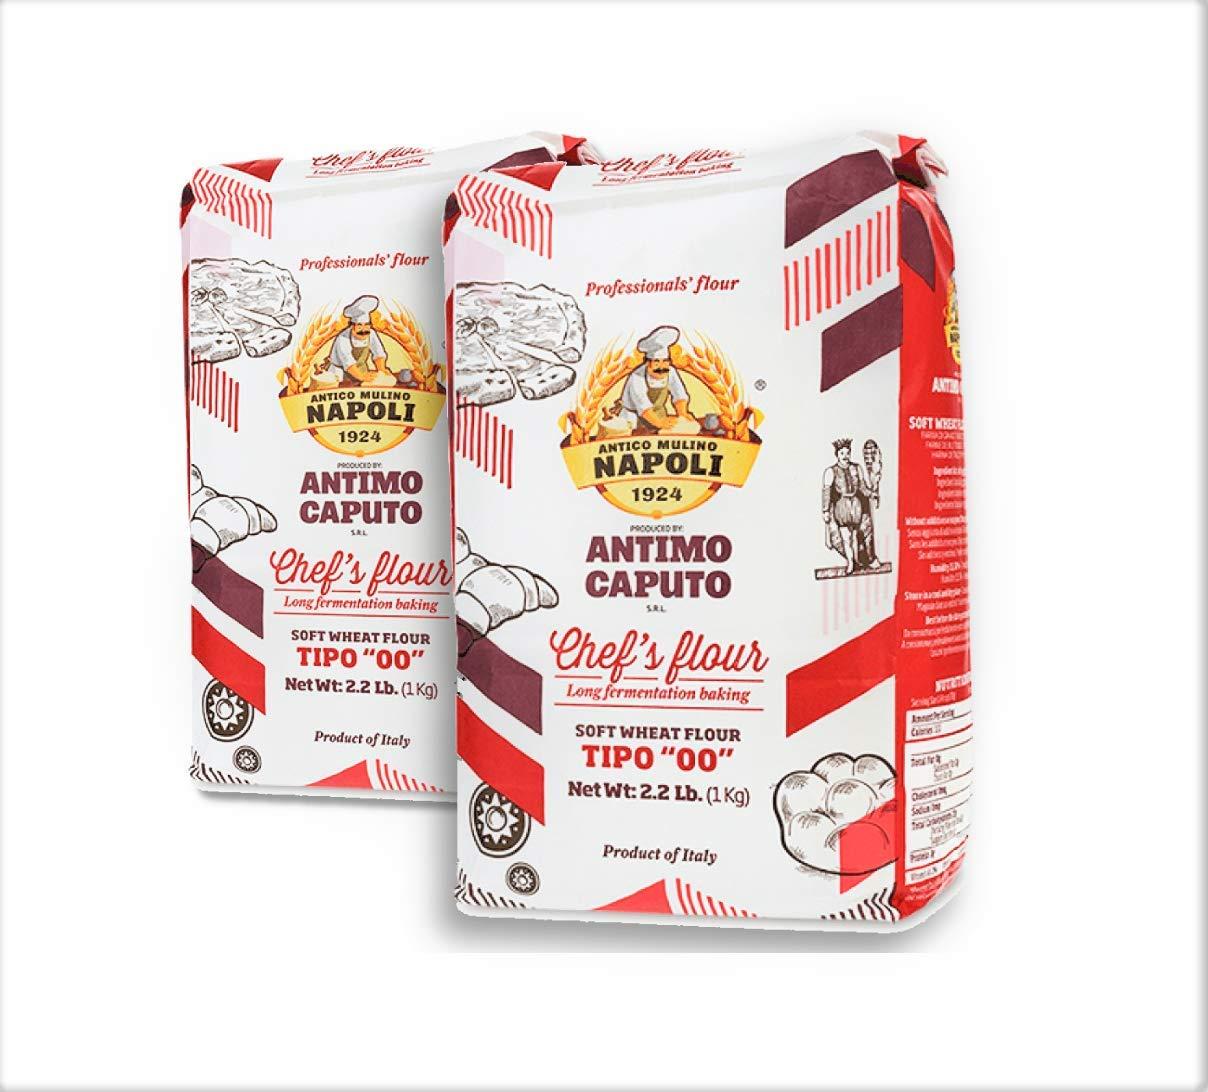 Antimo Caputo Chefs Flour 2.2 LB (Pack of 2) - Italian Double Zero 00 - Soft Wheat for Pizza Dough, Bread, & Pasta by Antimo Caputo